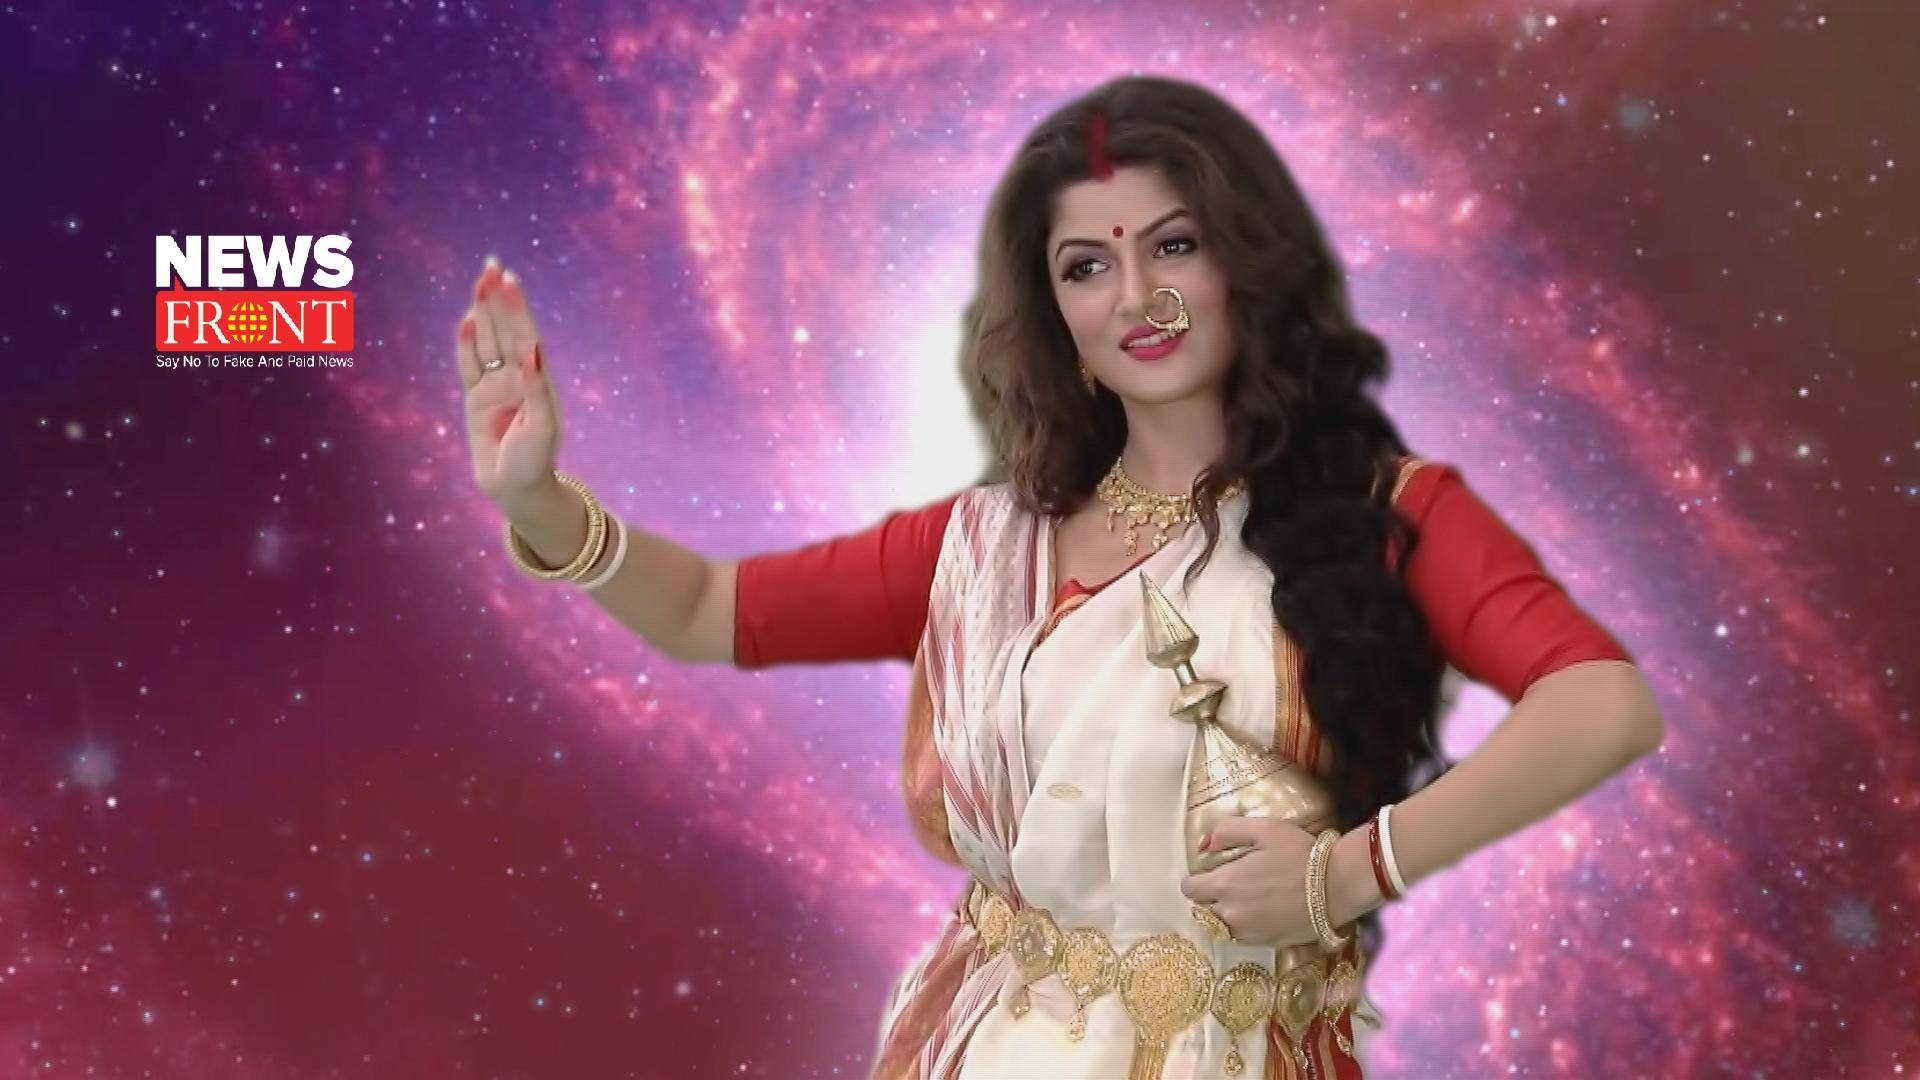 Srabanti Chattarjee | newsfront.co